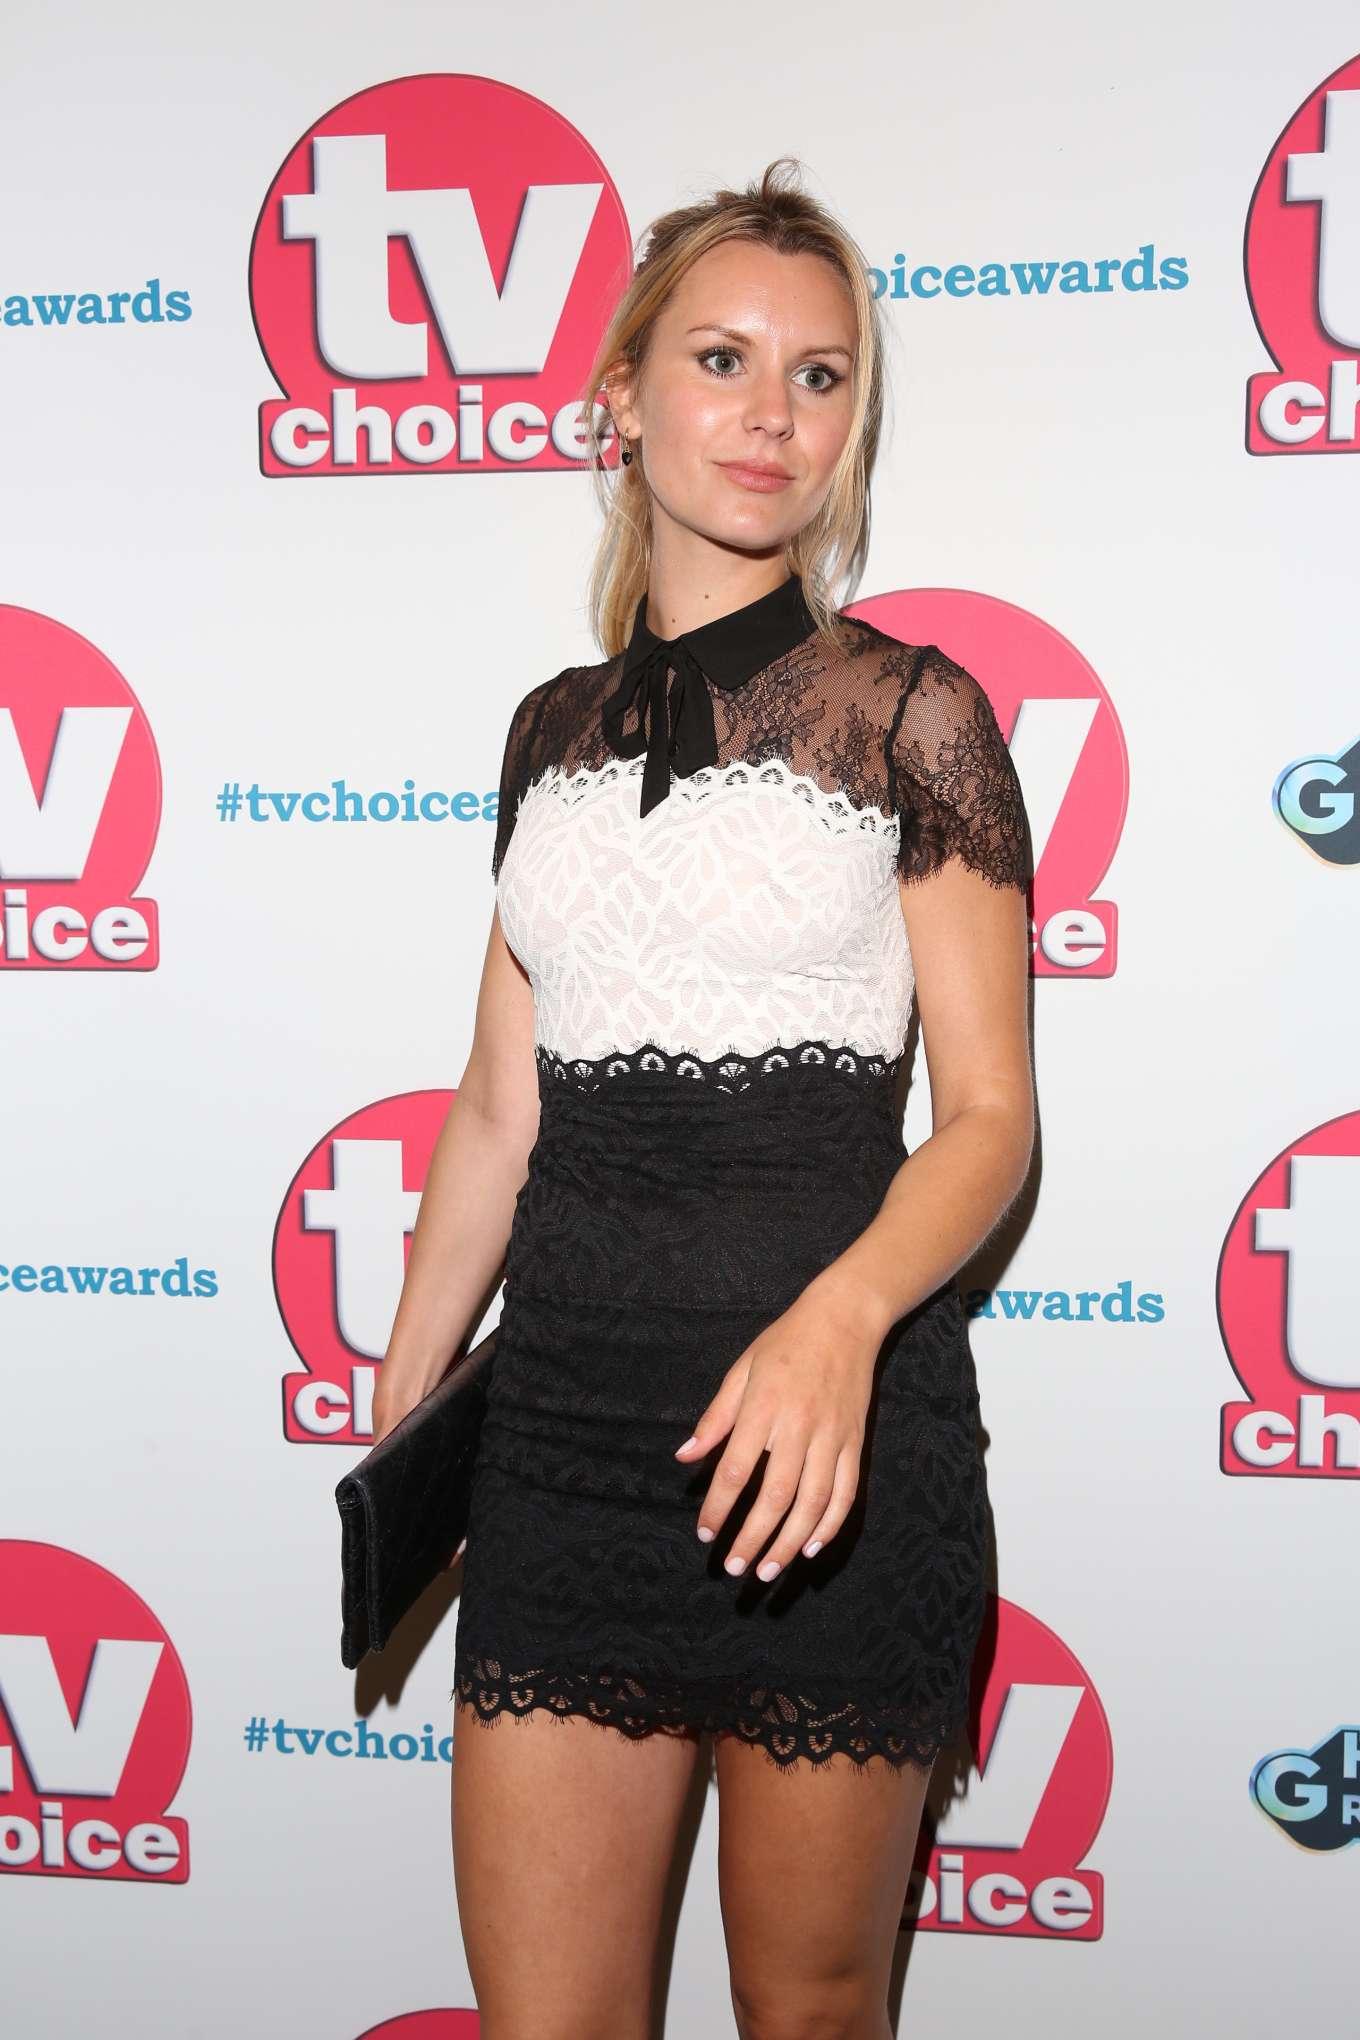 Olivia Bromley - 2019 TV Choice Awards in London